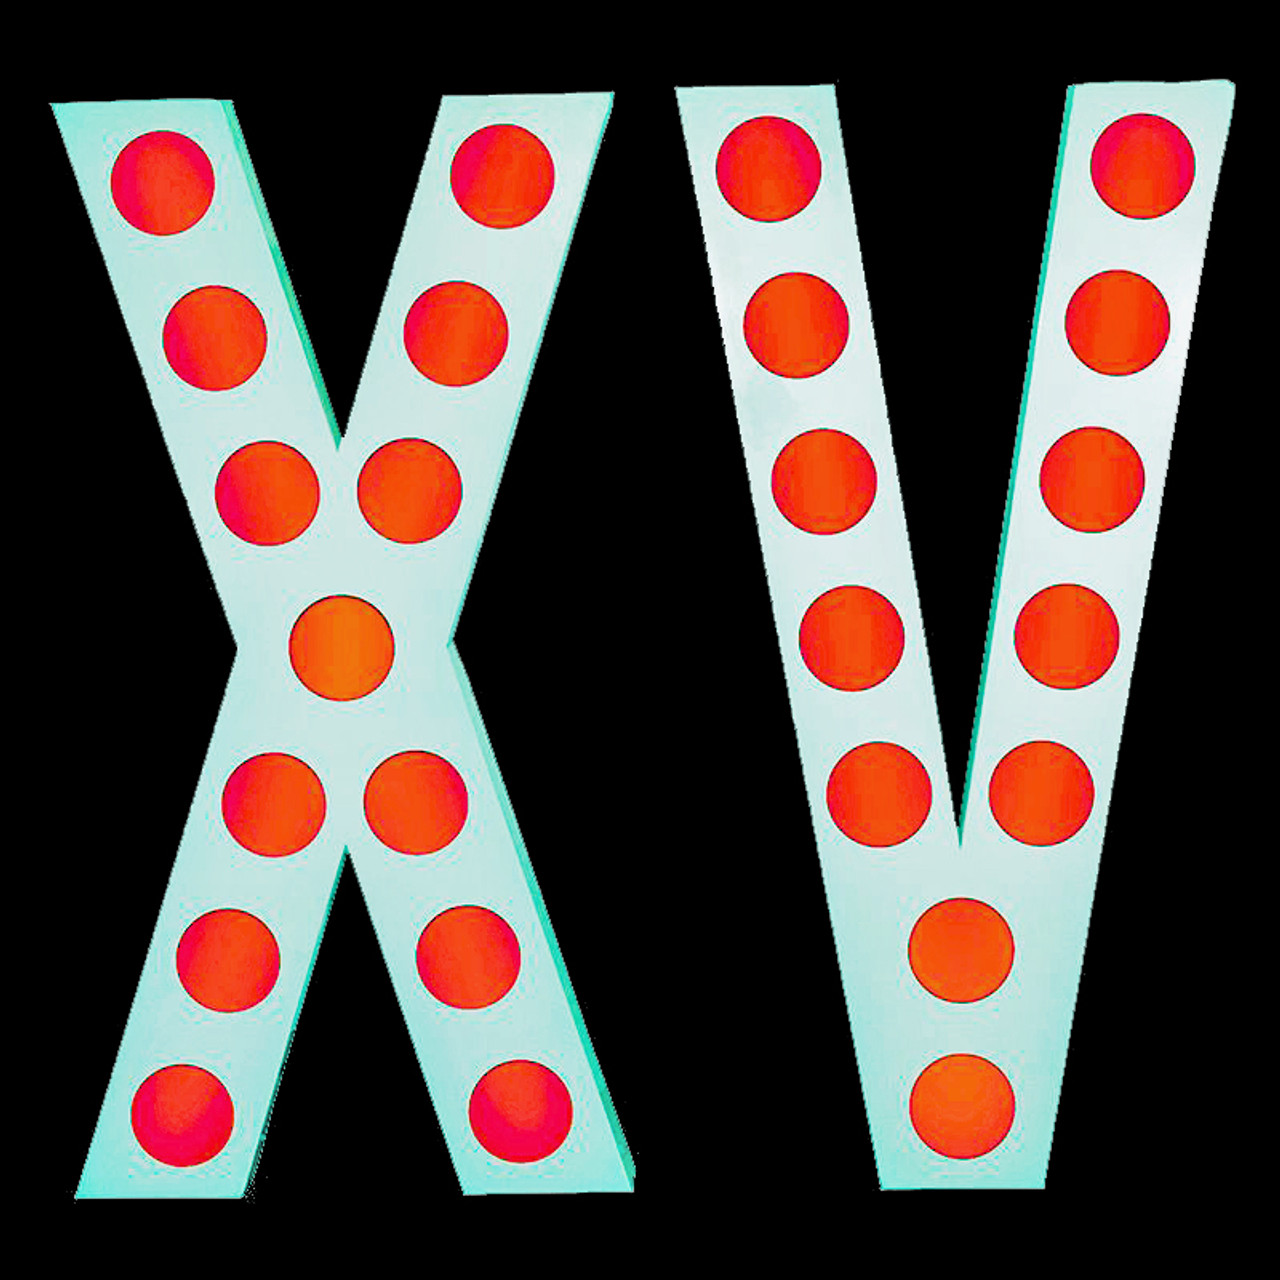 Eliminator Lighting Decor XV White Letters w/ LED Circle